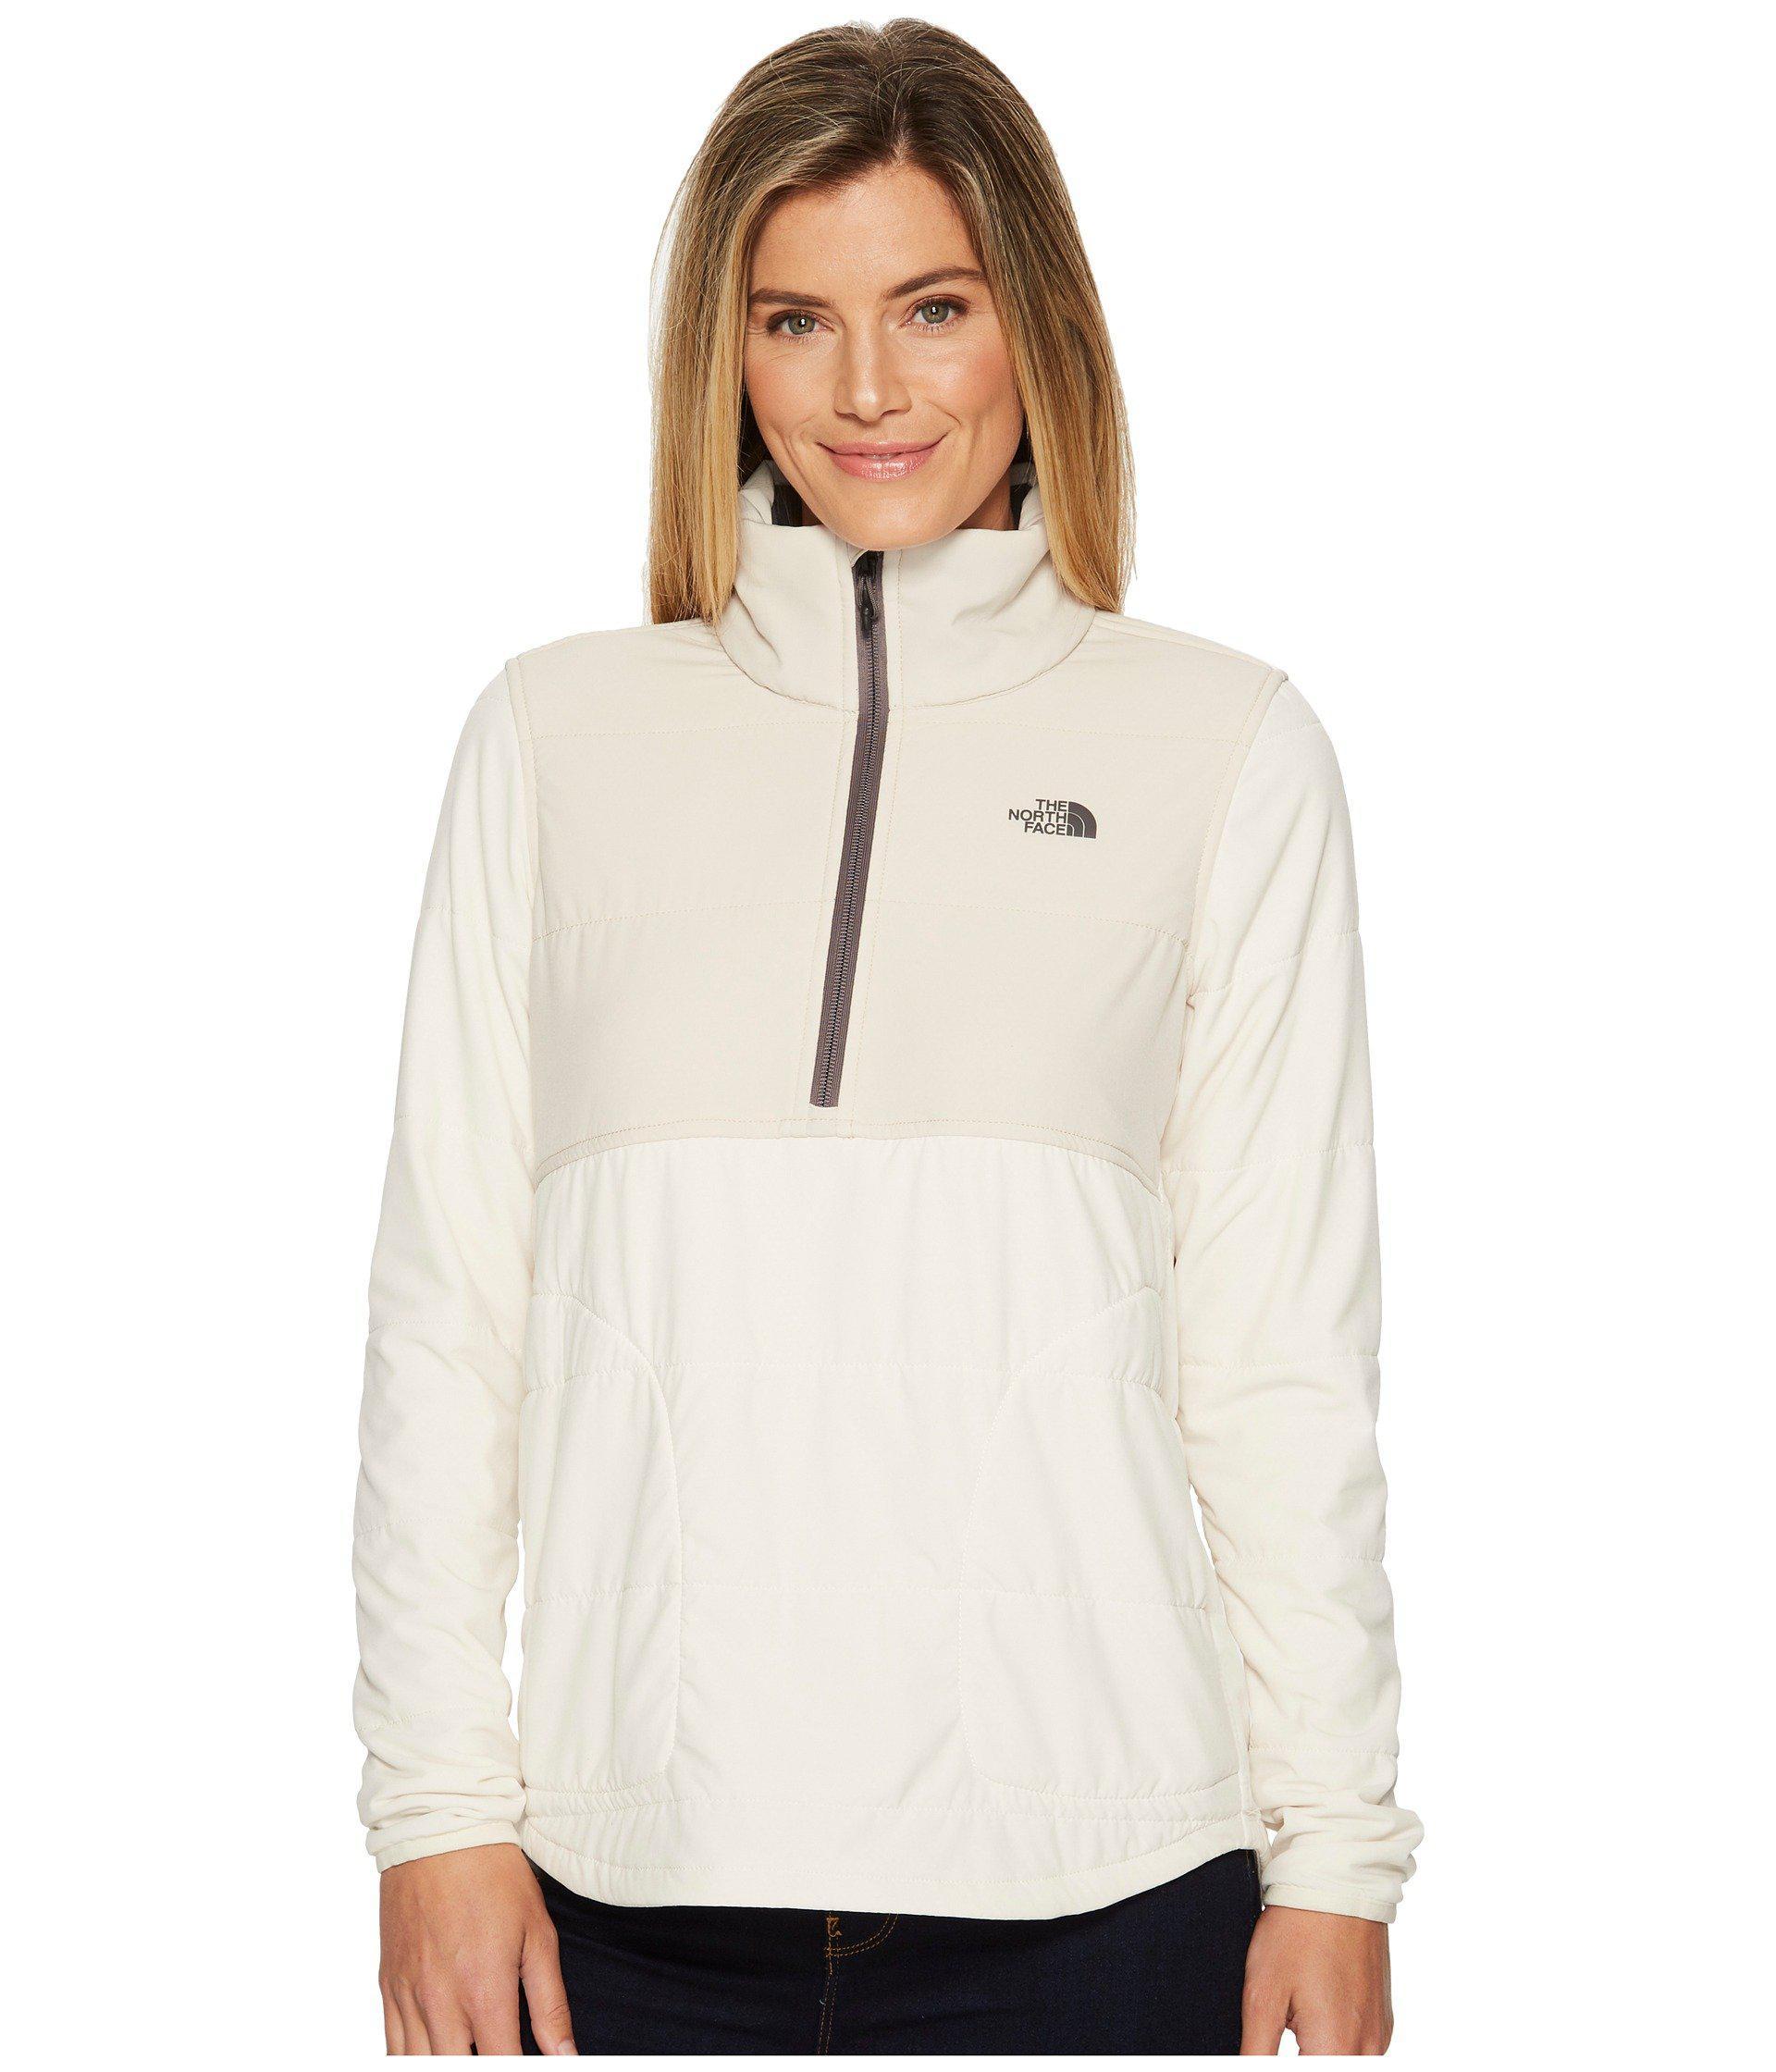 00f3b774e925 Lyst - The North Face Mountain Sweatshirt 1 4 Zip (mid Grey asphalt ...